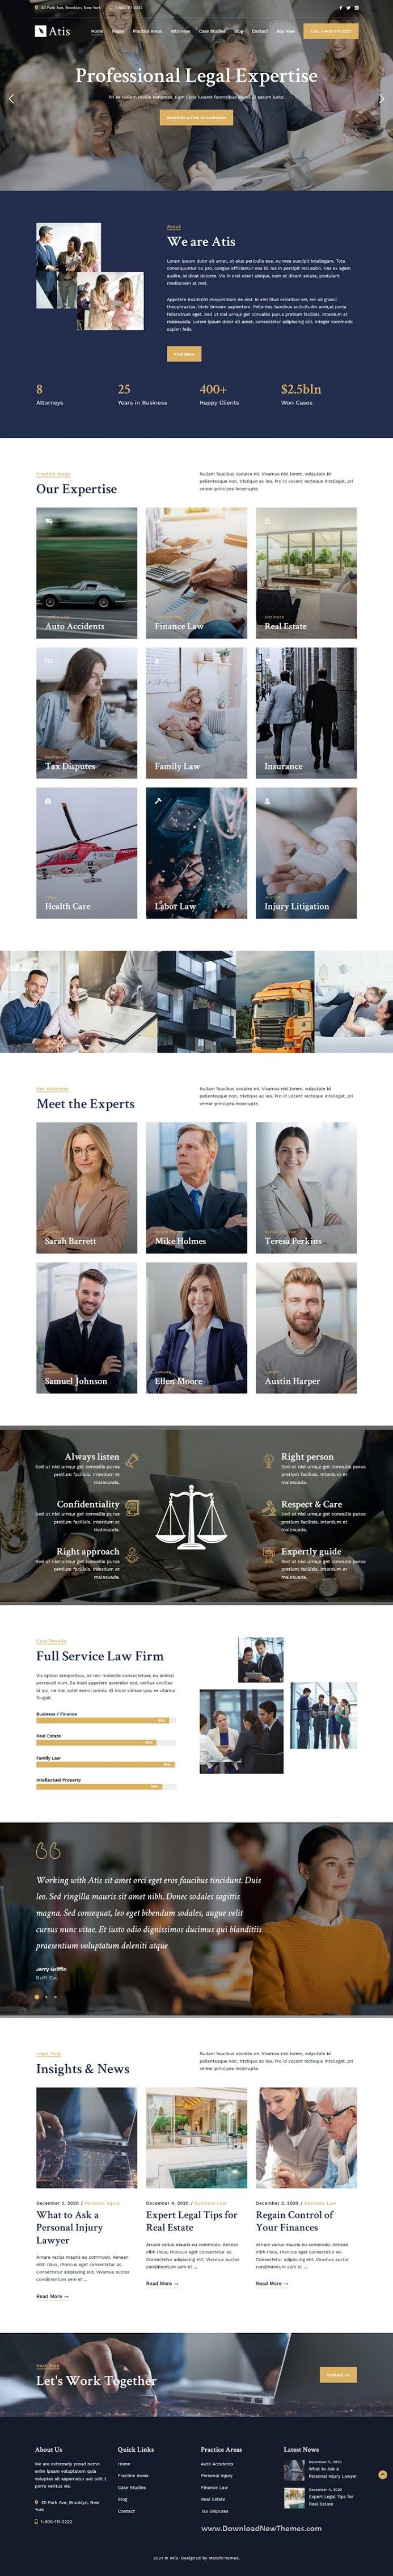 Lawyers Advisors Business Website Theme